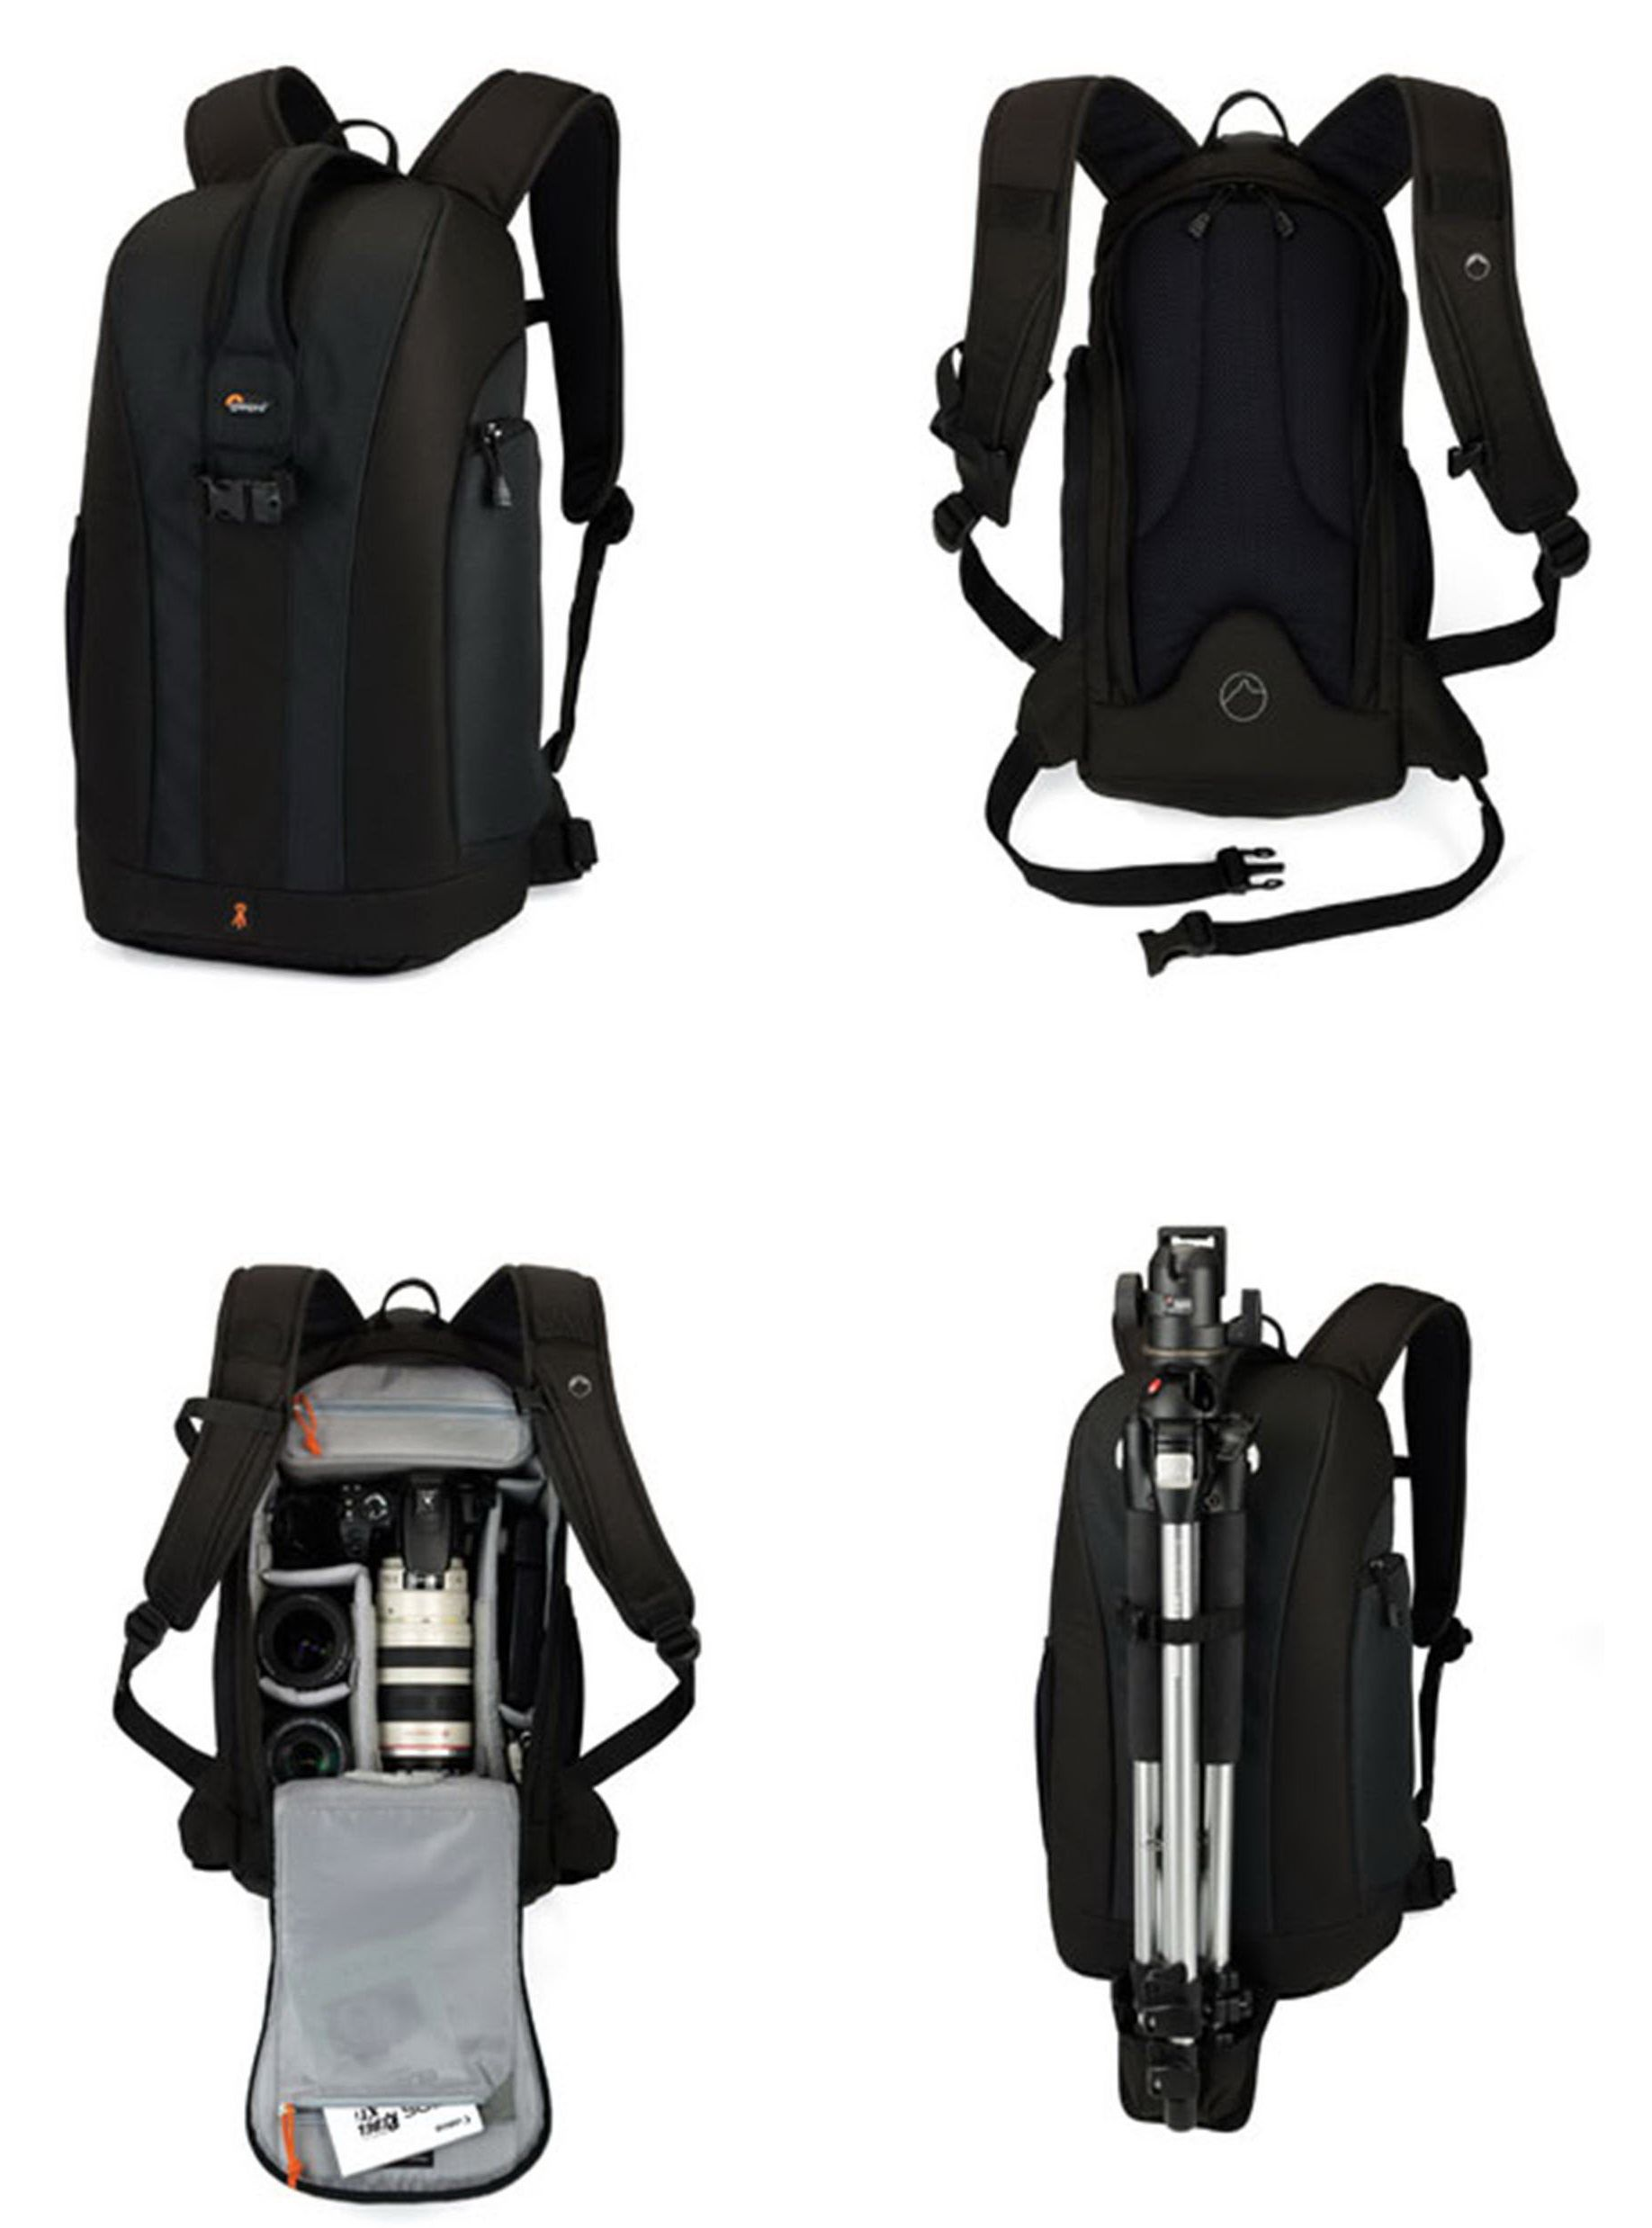 Lowepro Flipside 300 Marca Tradicional Para Transporte De Equipamento Fotogrfico